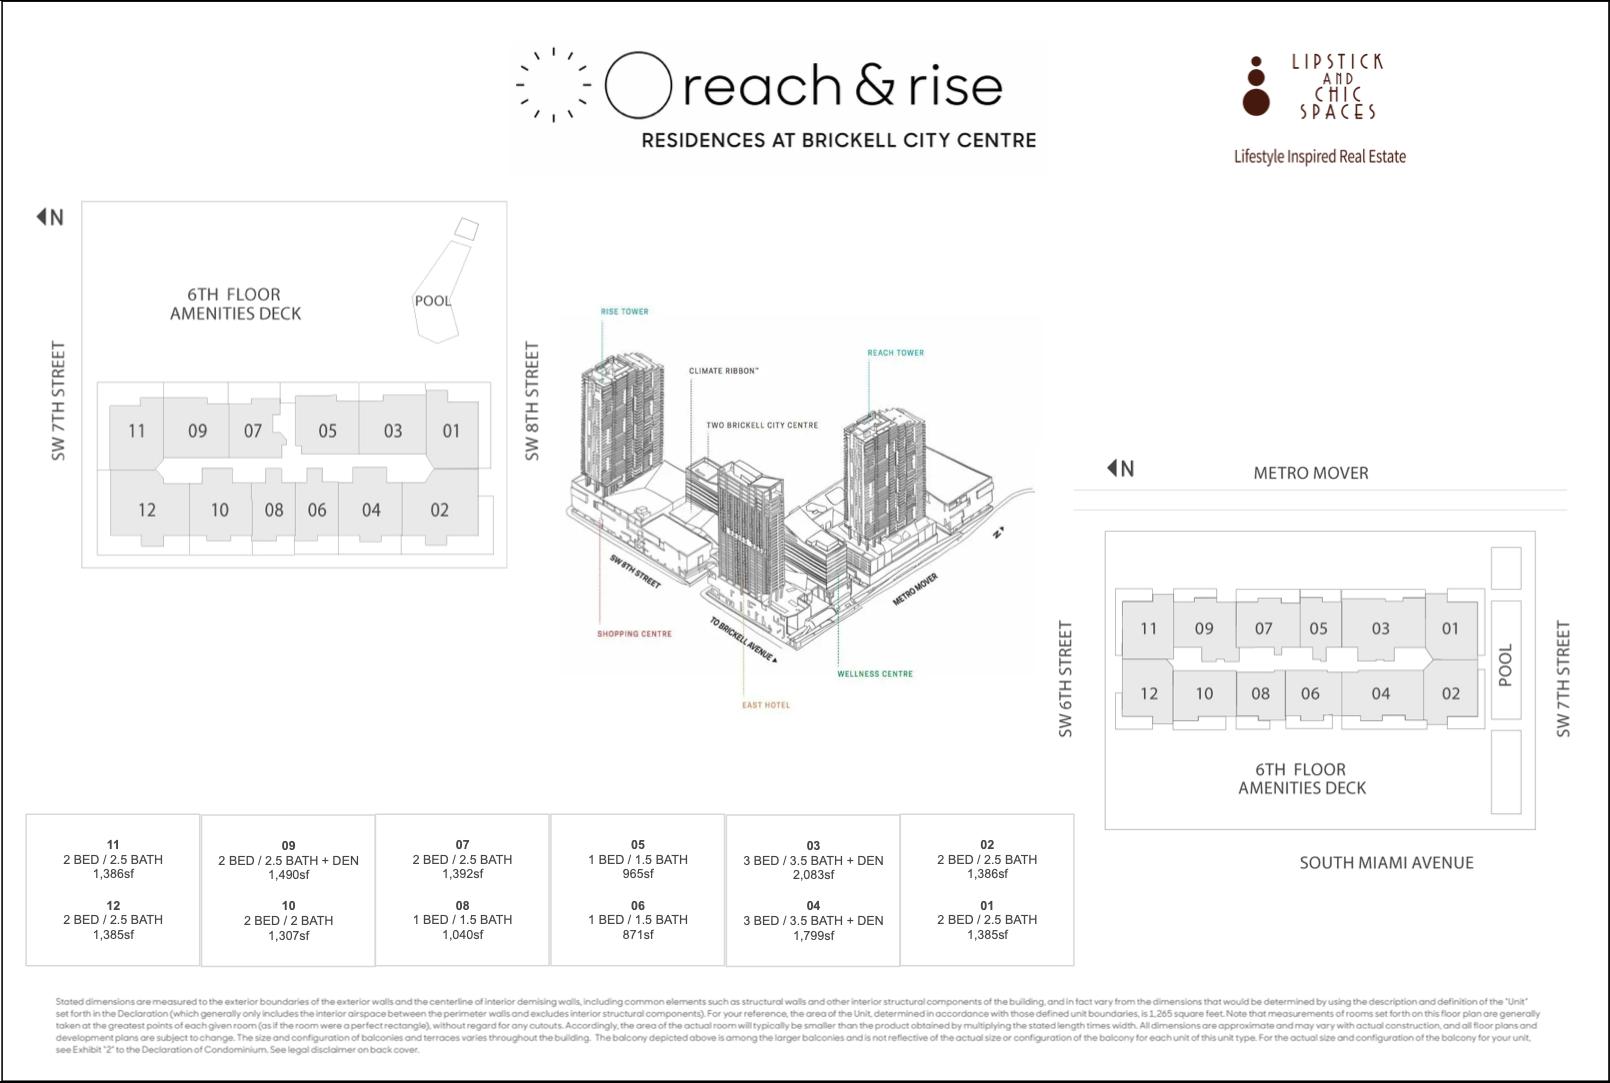 key-plan-reach-rise-brickell-city-centre_lipstickandchicspaces.com.png